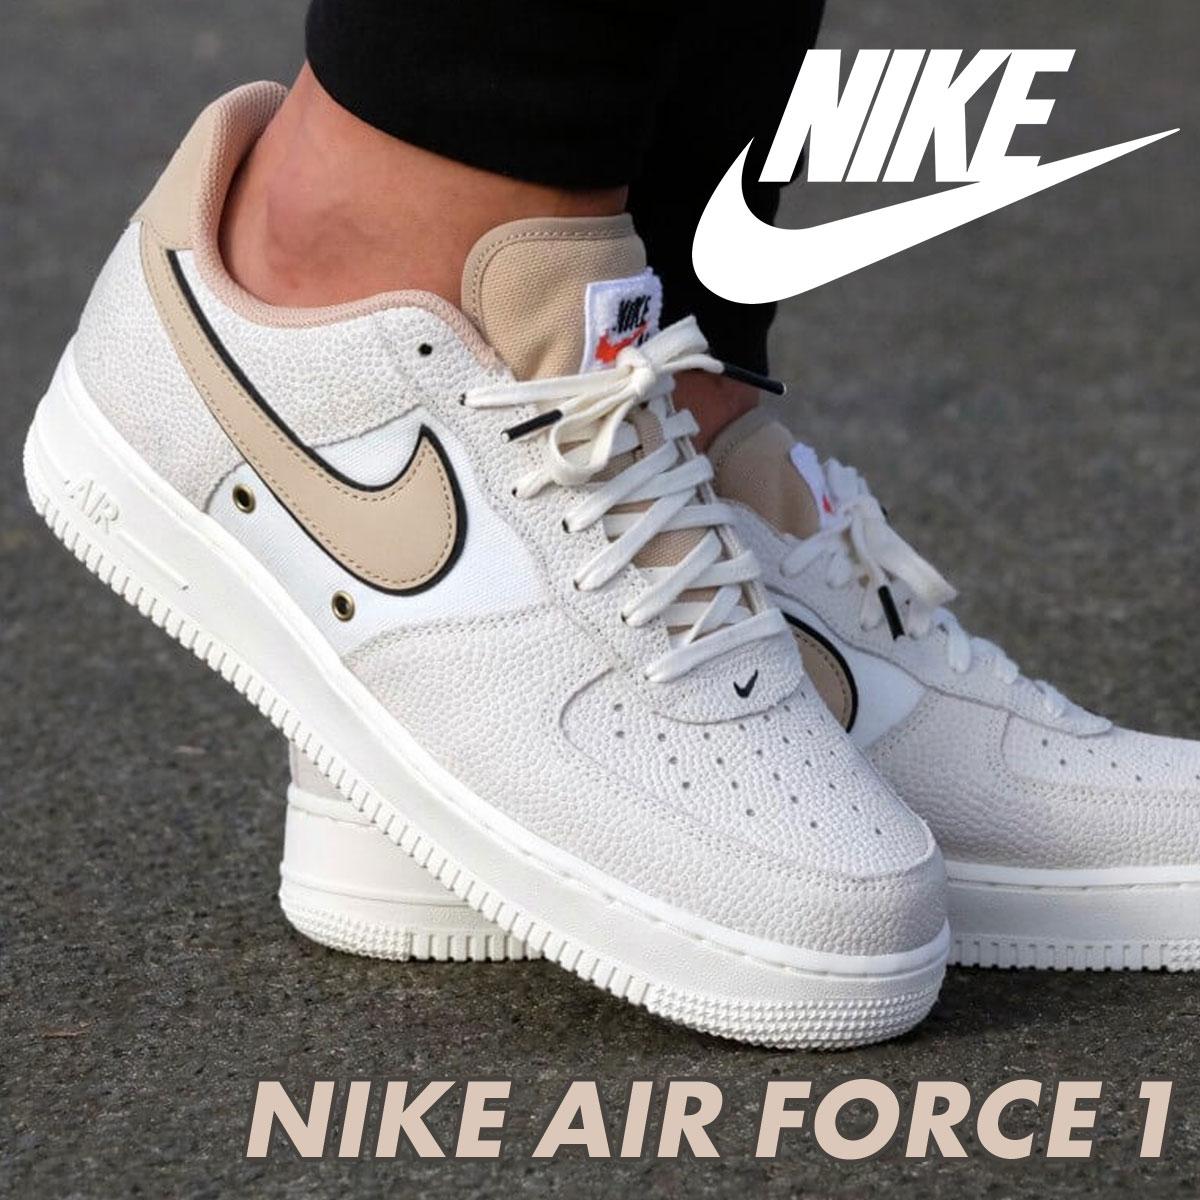 promo code 23f2e 2302a NIKE AIR FORCE 1 Nike air force 1 07 LV8 sneakers men 718,152-109 off-white   2 14 Shinnyu load   182